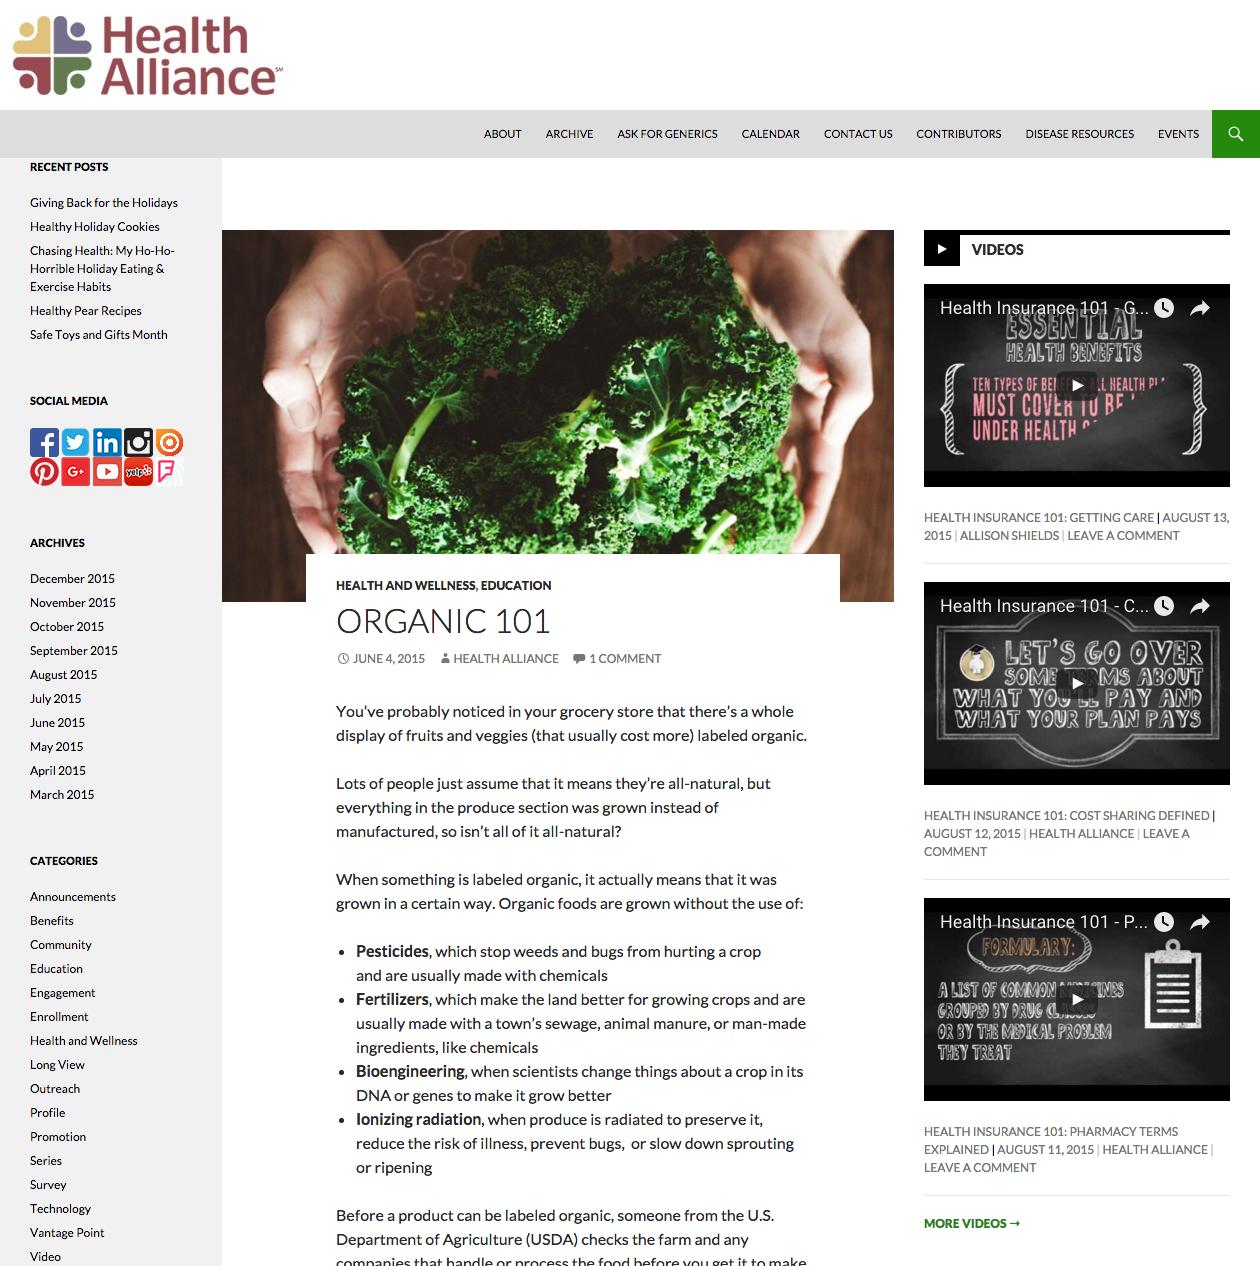 Organic 101 Blog Post